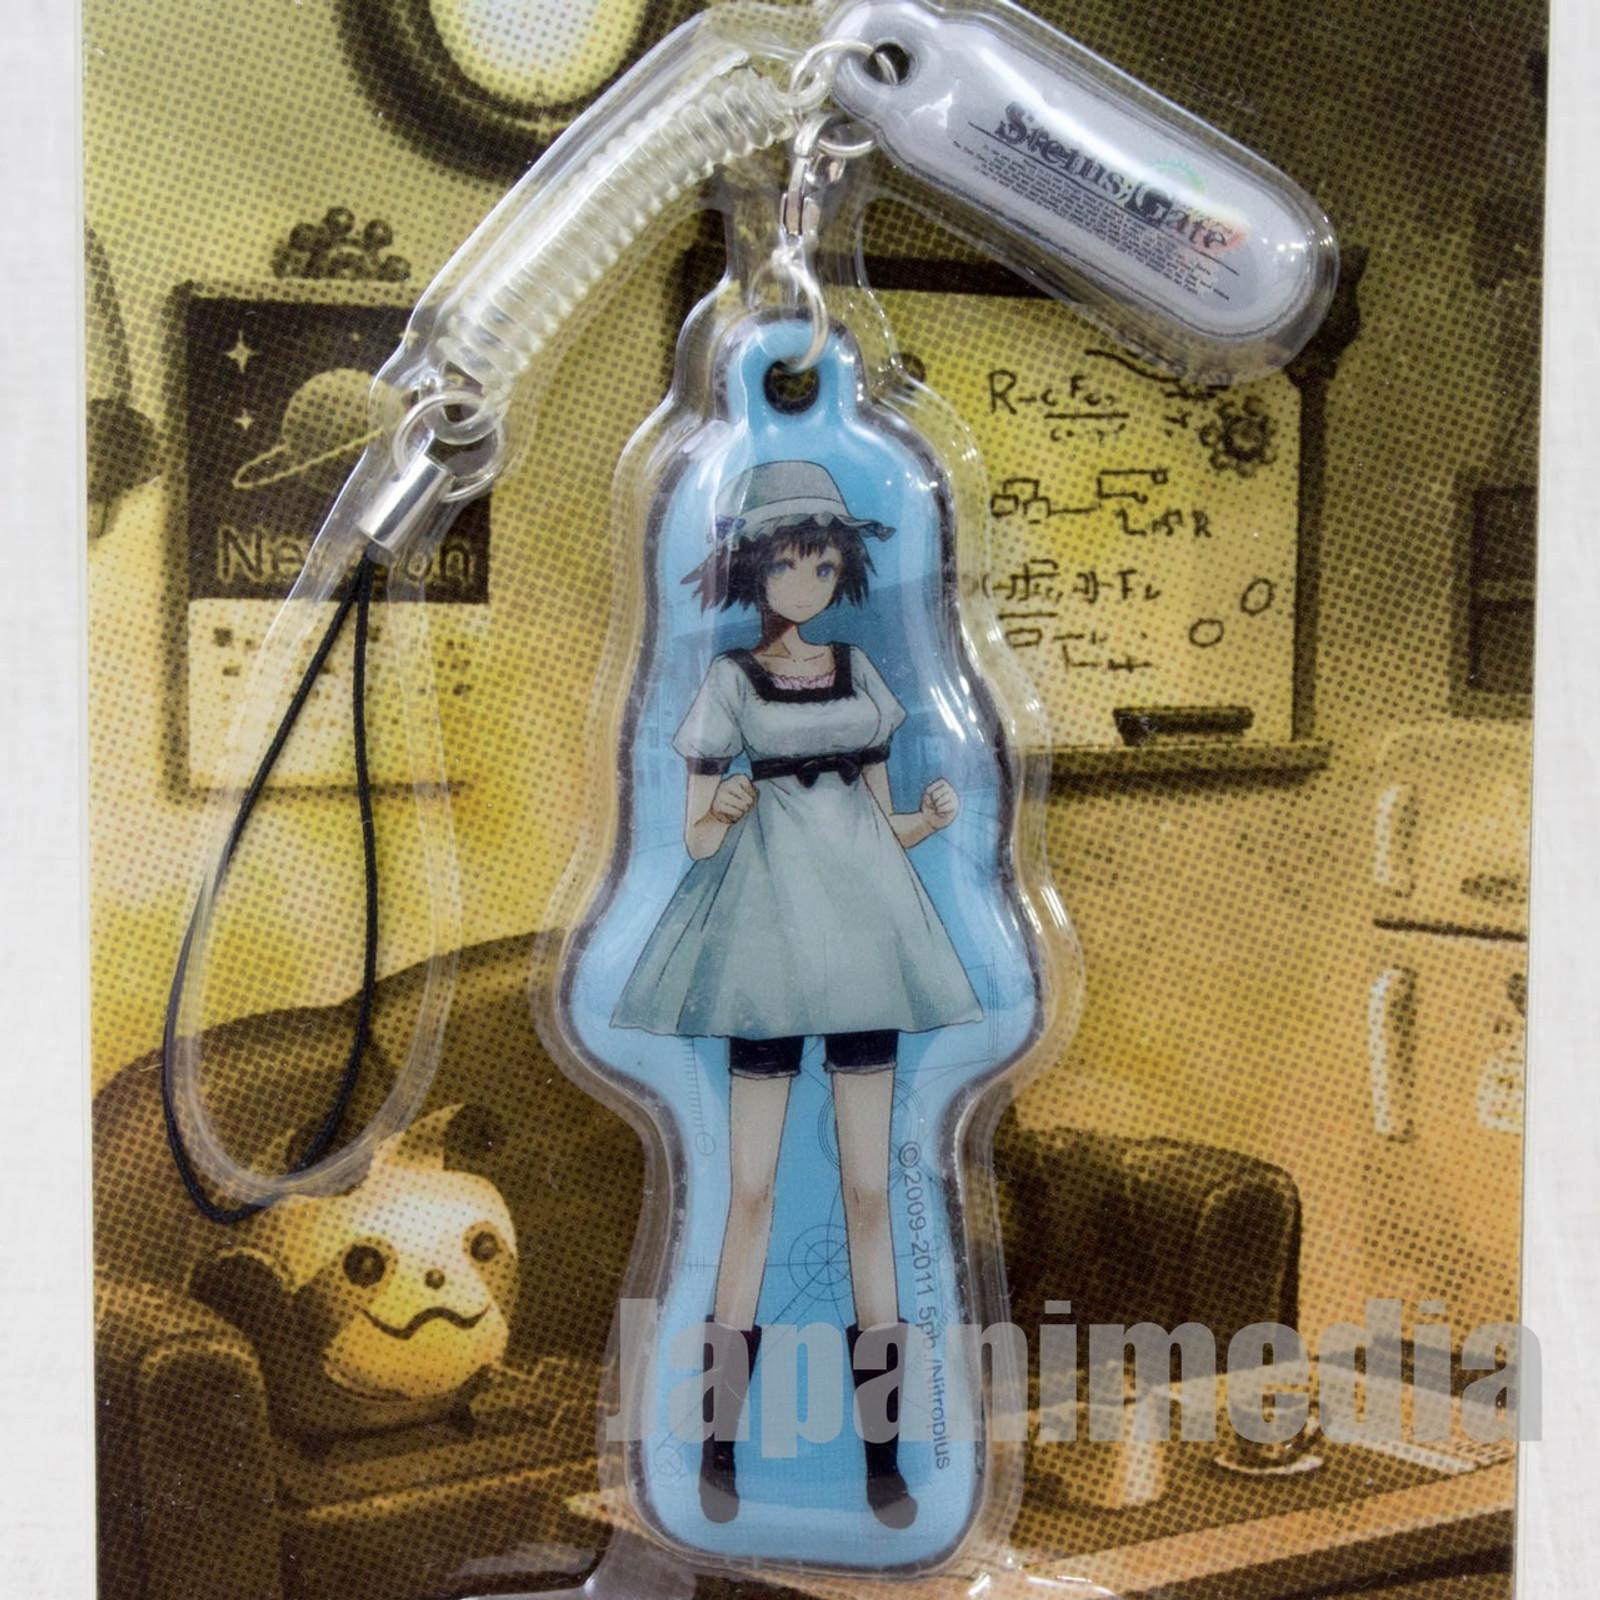 Steins ; Gate Mayuri Shiina Display Cleaner Mascot Strap Taito JAPAN ANIME